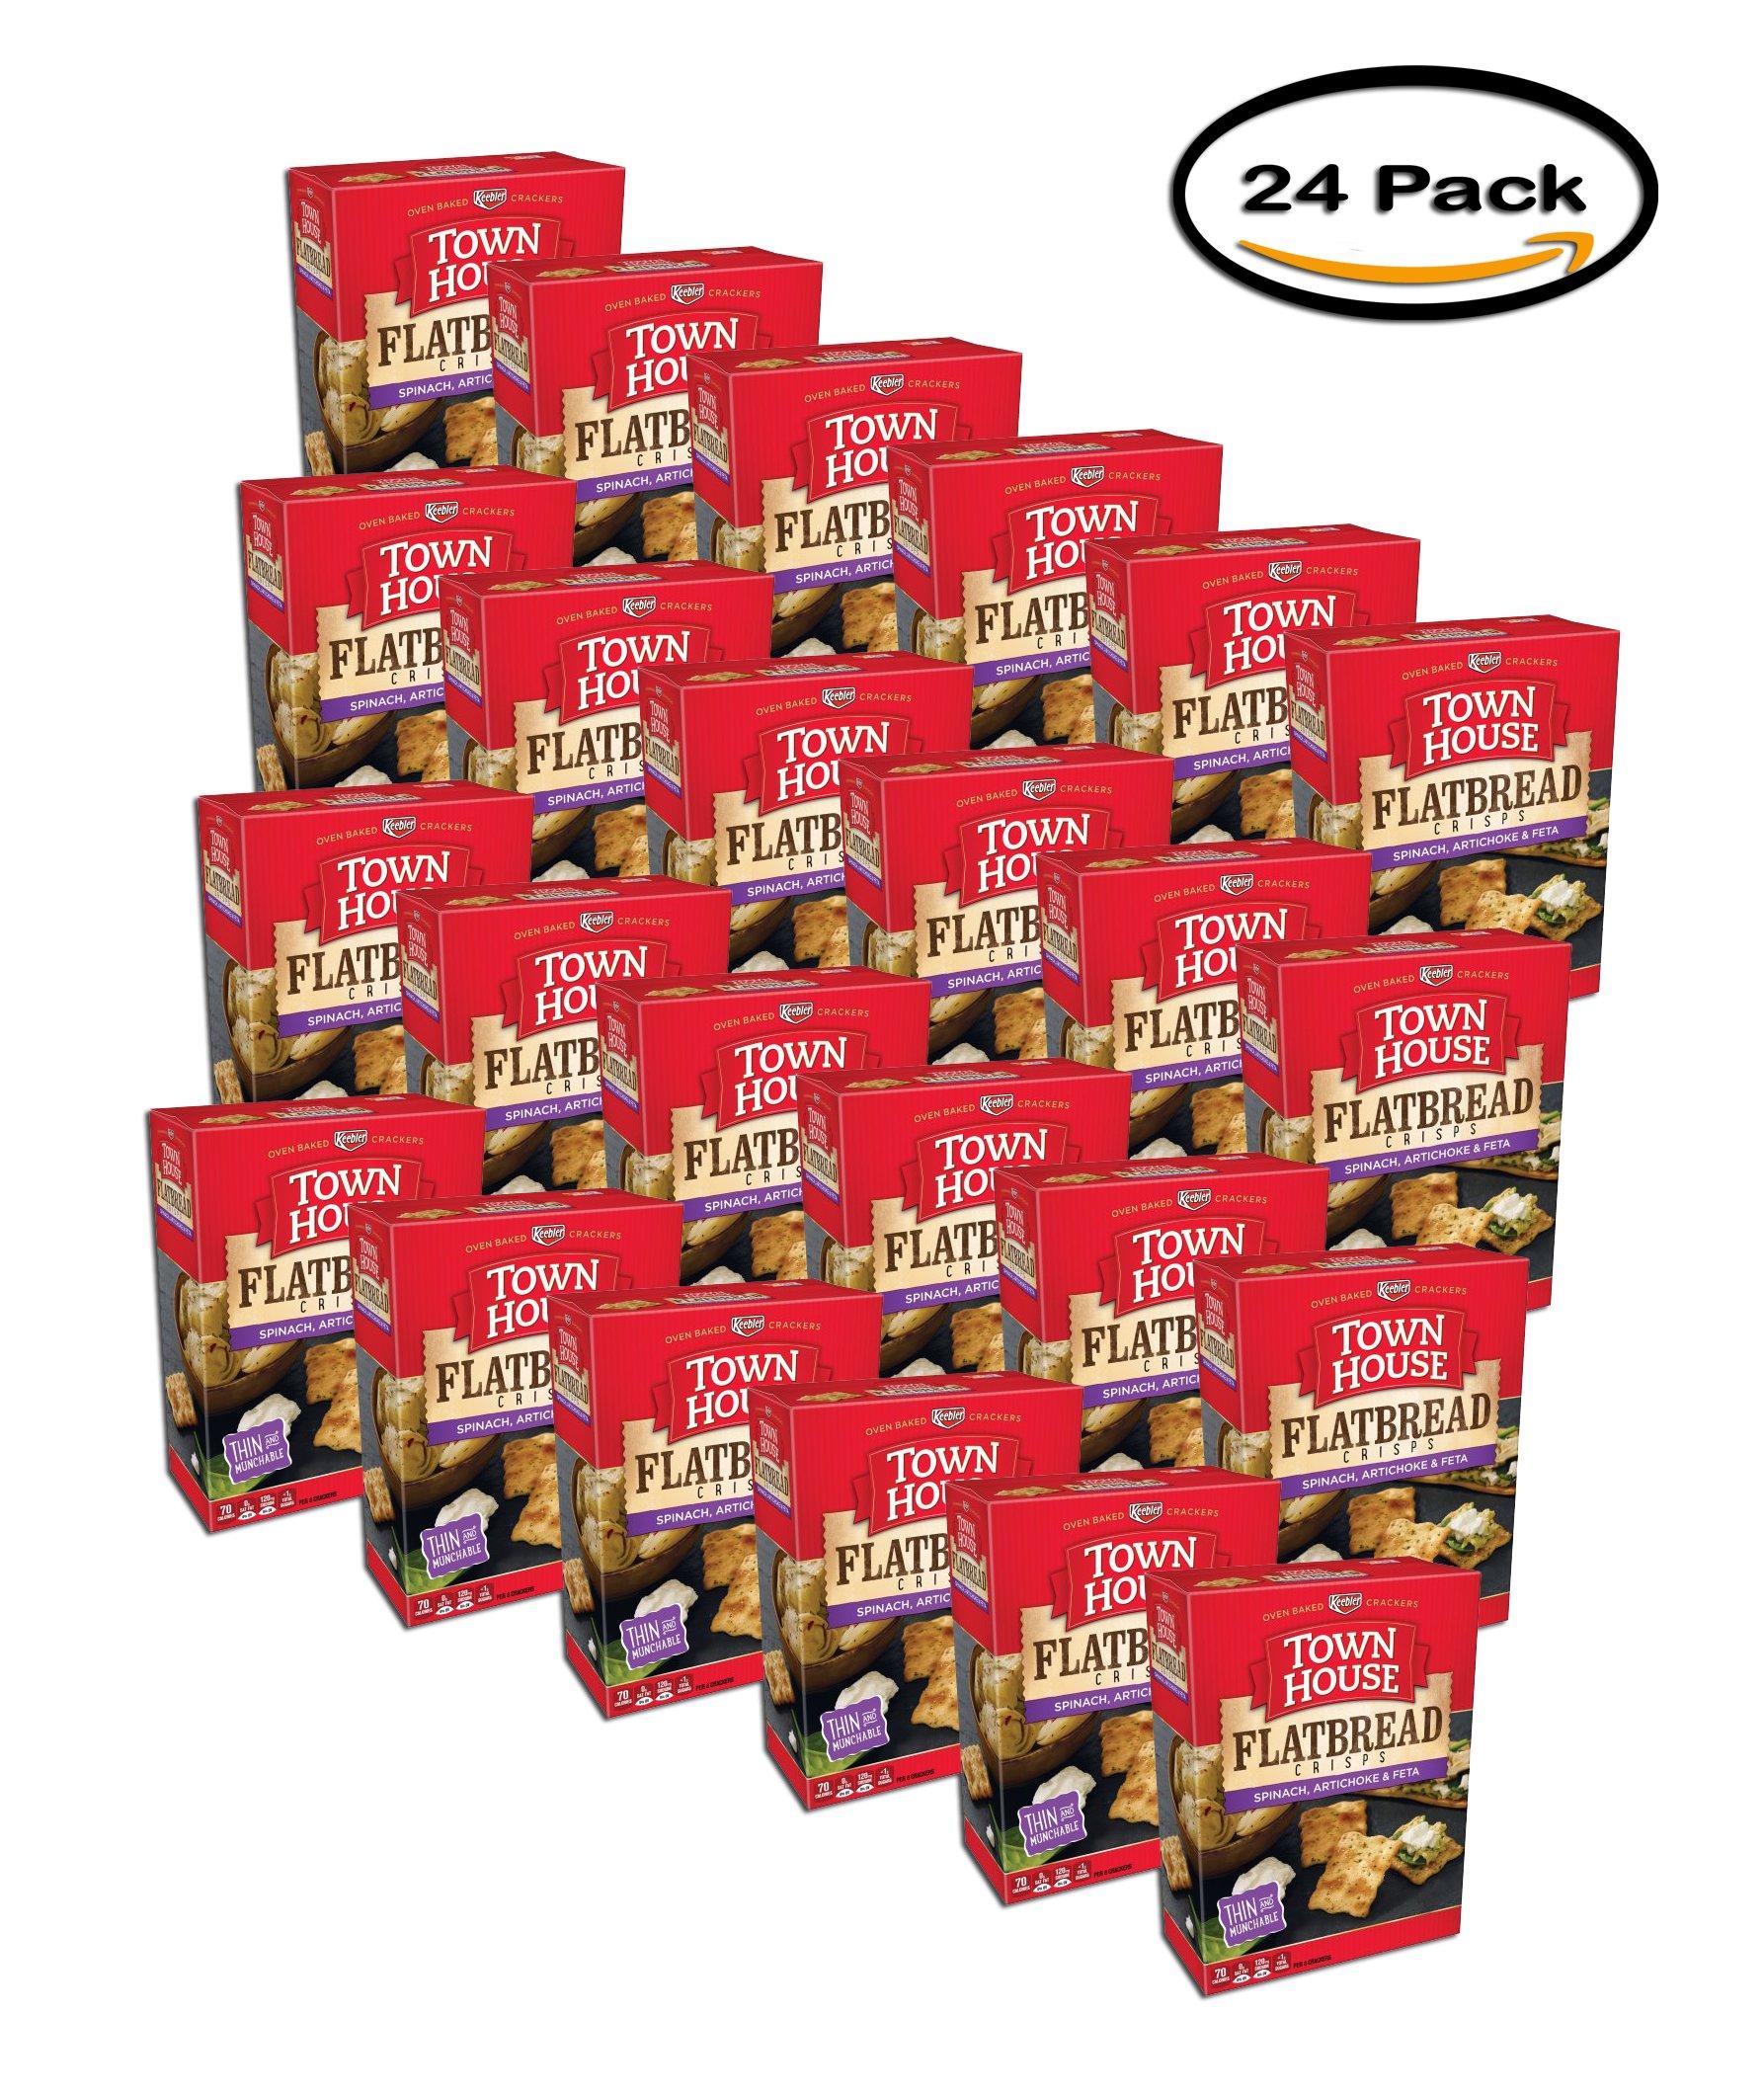 PACK OF 24 - Town House Spinach, Artichoke & Feta Flatbread Crisps 9.5 oz. Box by Keebler